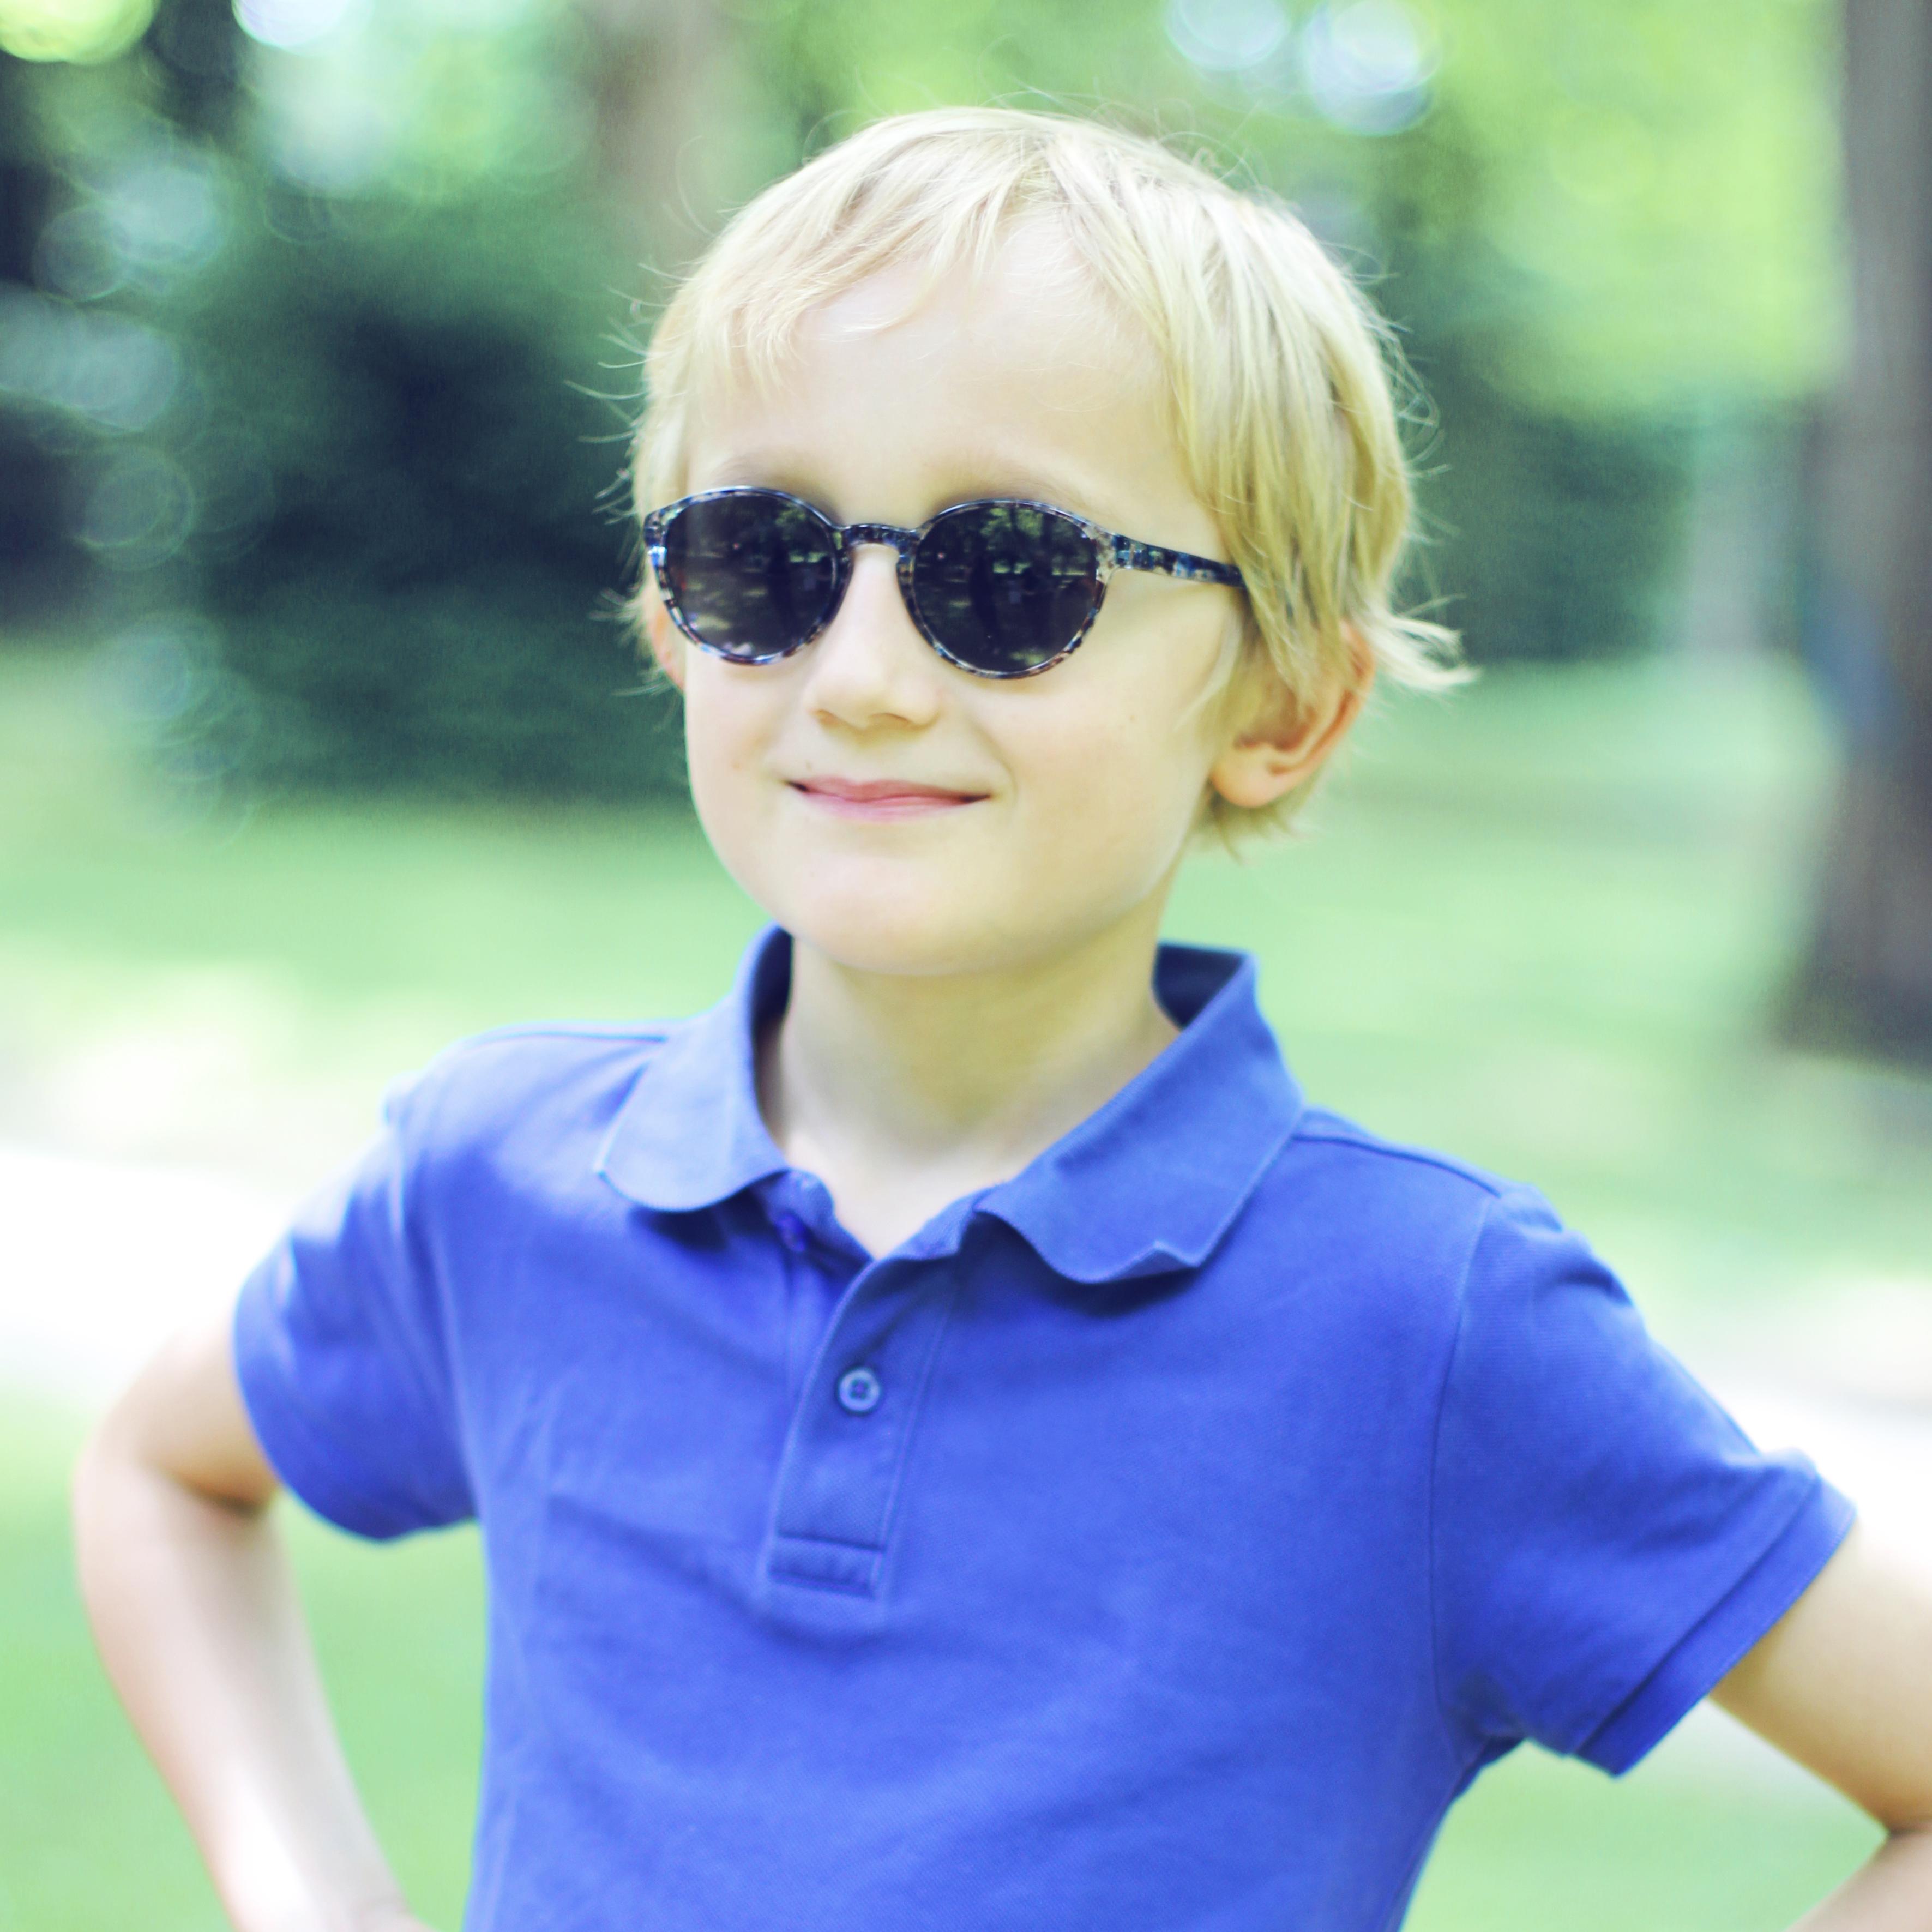 Kid, Optiek Karine, Heusden-Zolder,Limburg